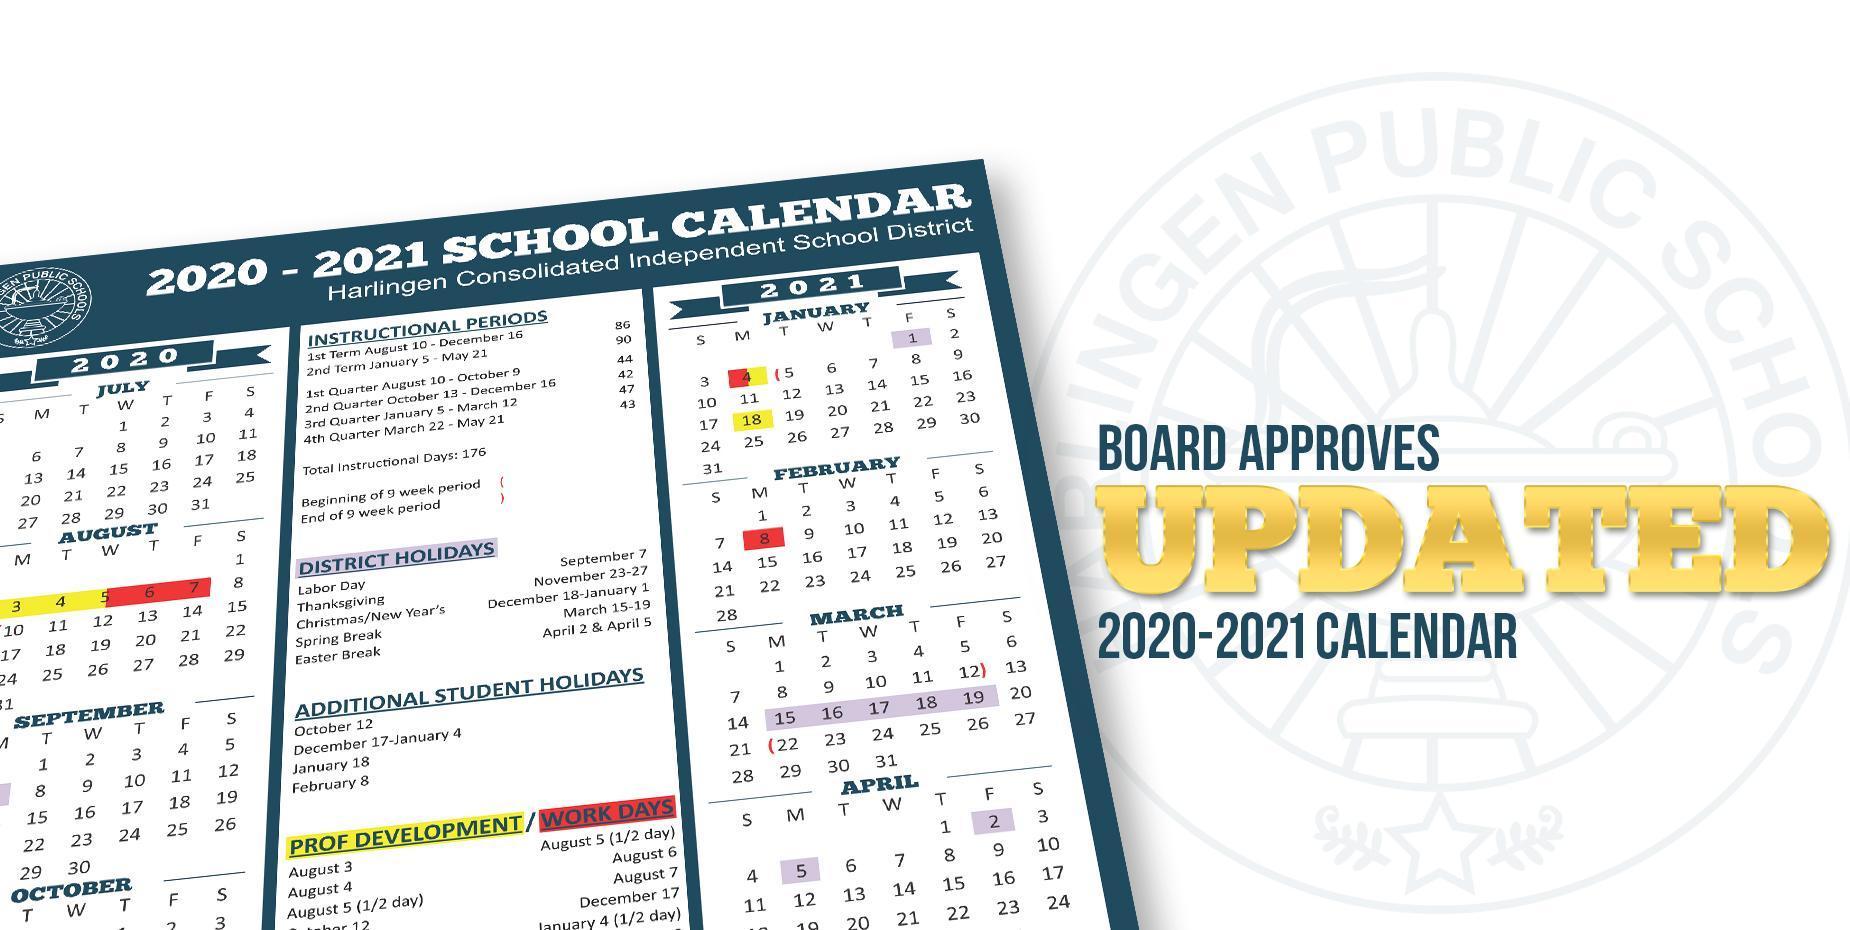 Board Approves updated 2020-2021 Calendar